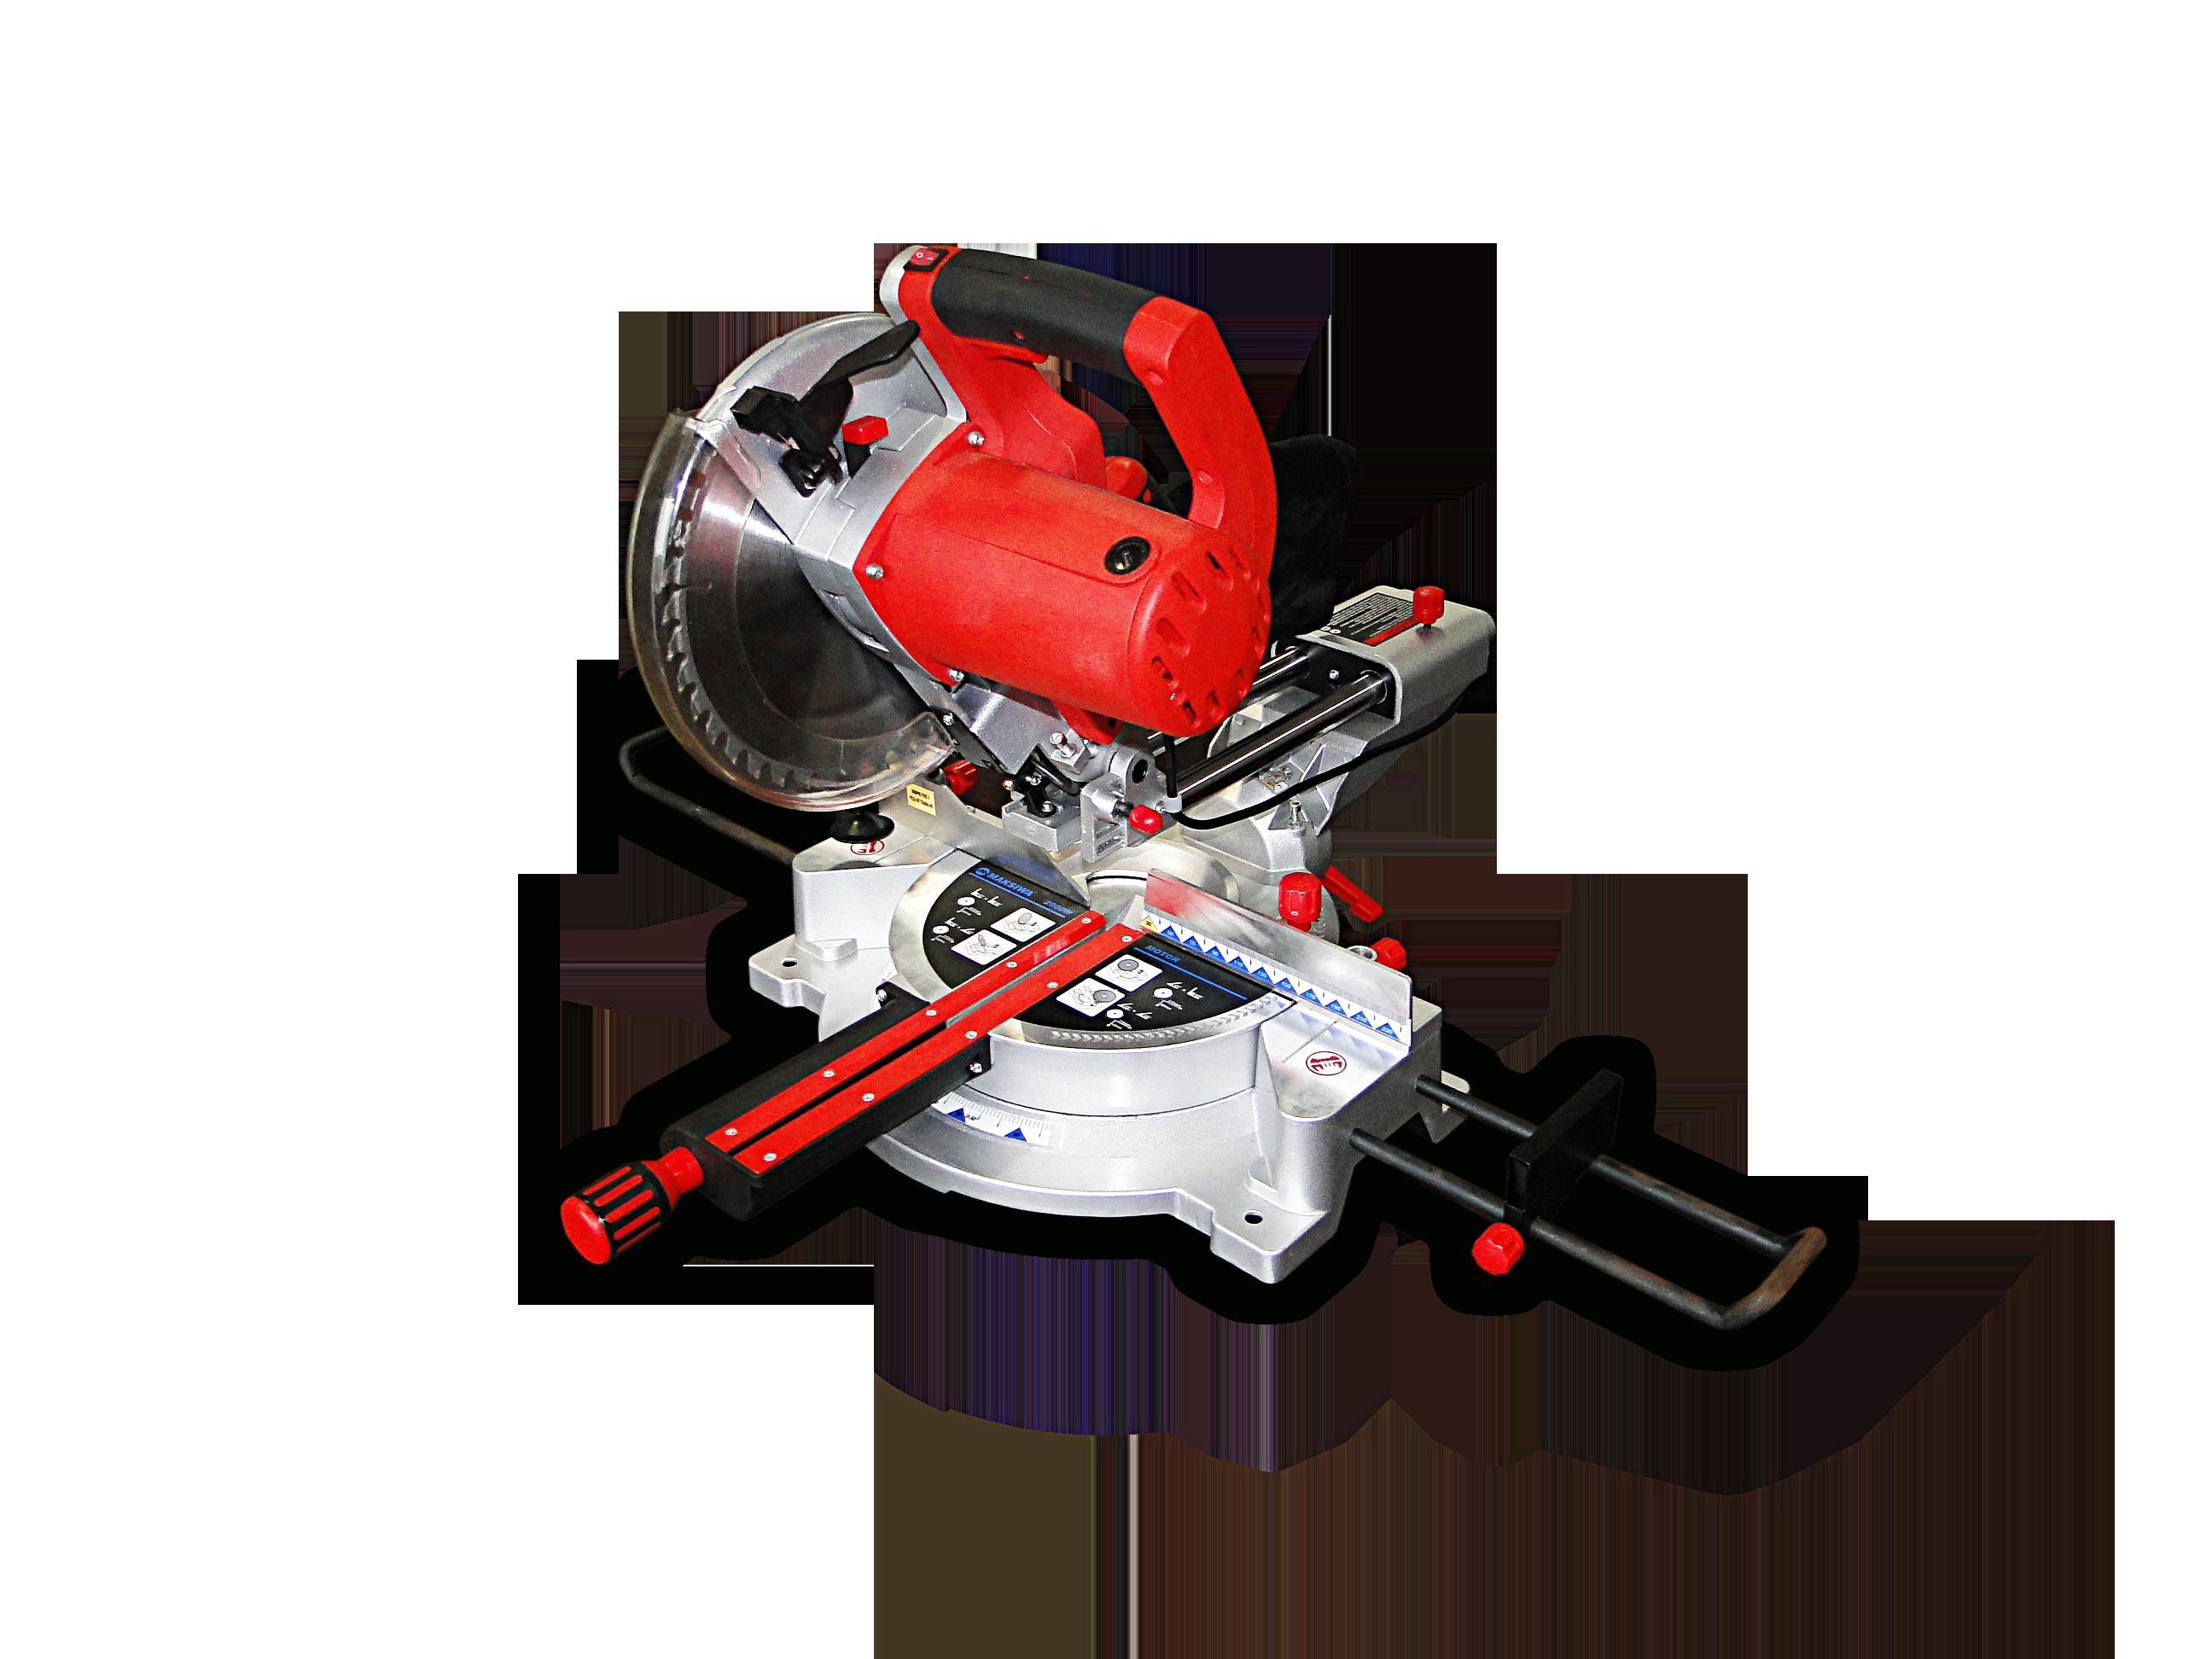 miter-saw-mk300i (3)